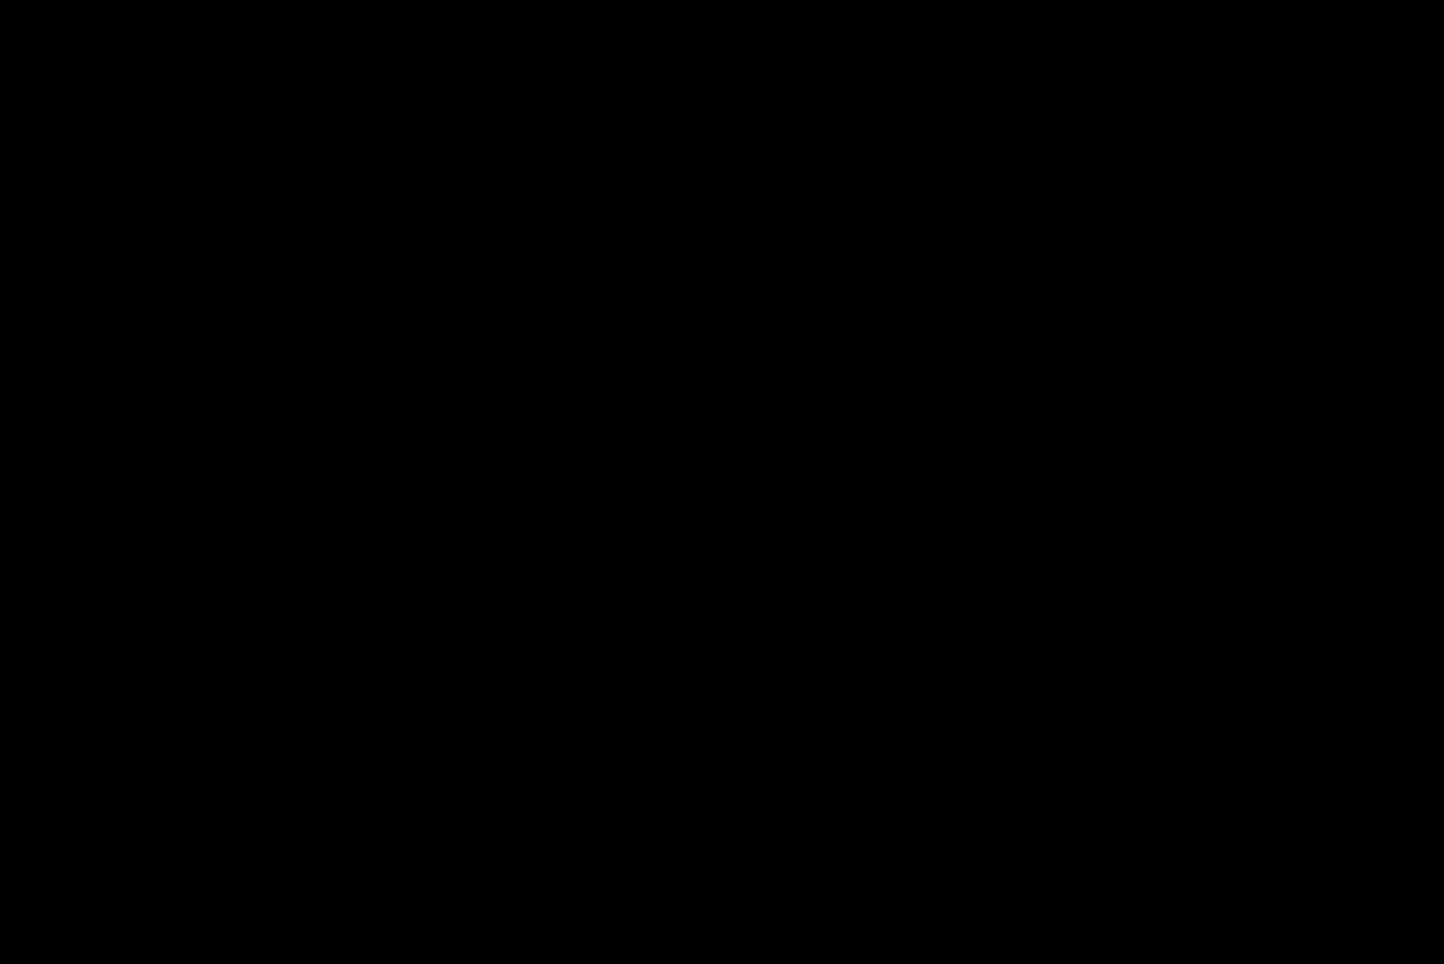 Peperonata i grillowane parówki